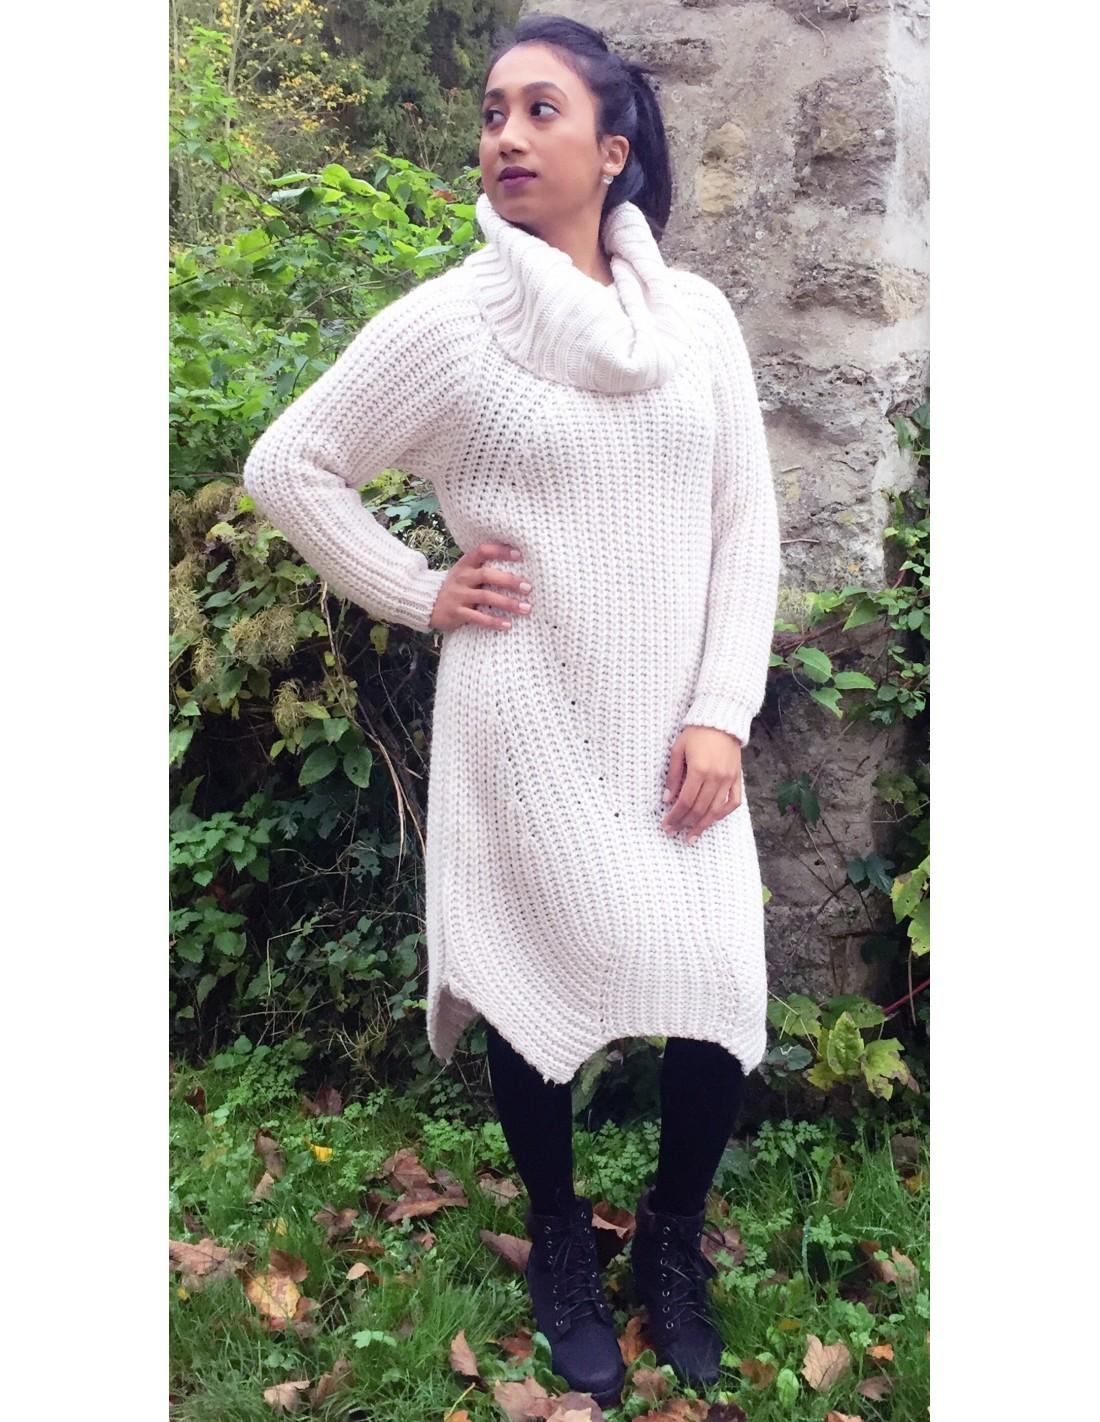 robe pull laine col roul en grosse maille pour femme divers coloris. Black Bedroom Furniture Sets. Home Design Ideas